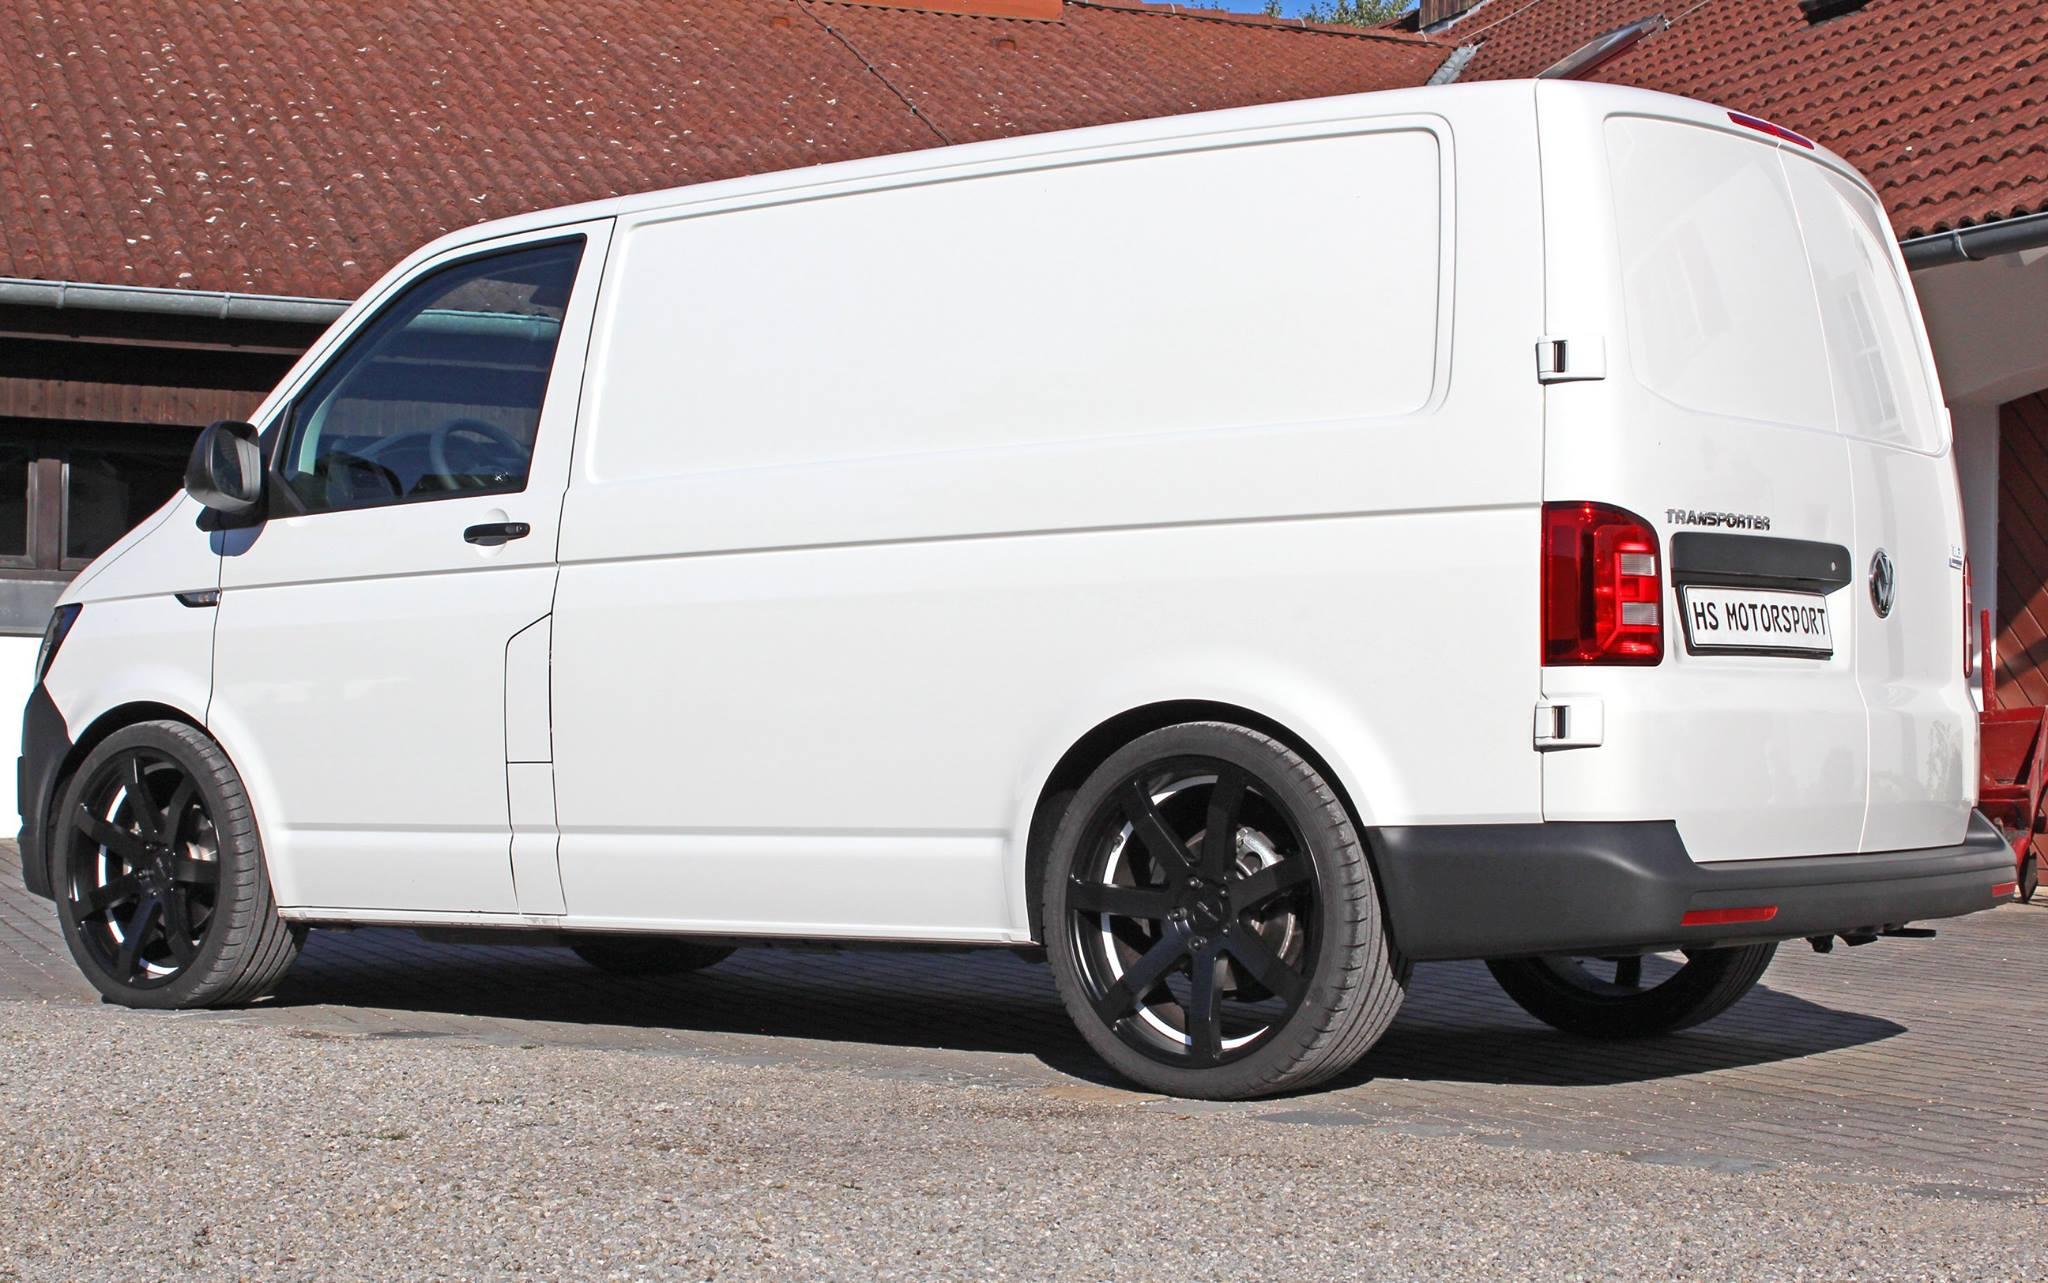 Volkswagen T6 Transporter 2.0 TDI Tuned by HS Motorsport ...